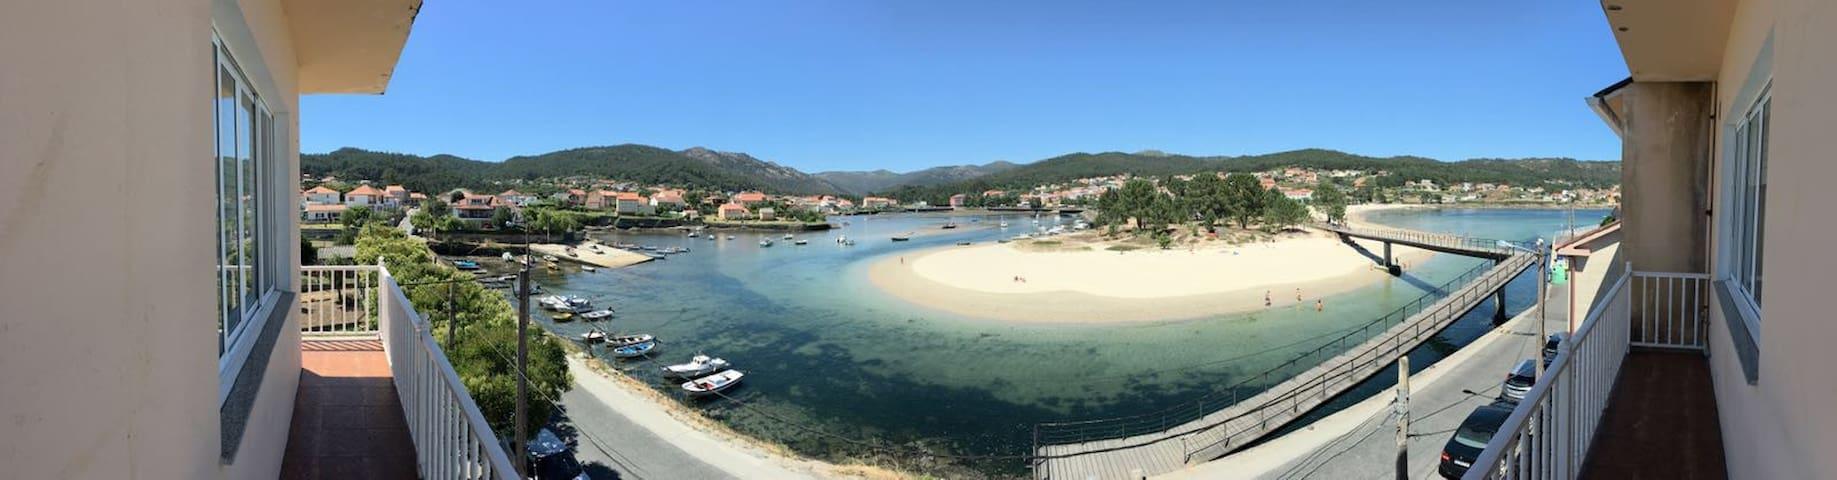 La playa a tus pies - Muros - Holiday home